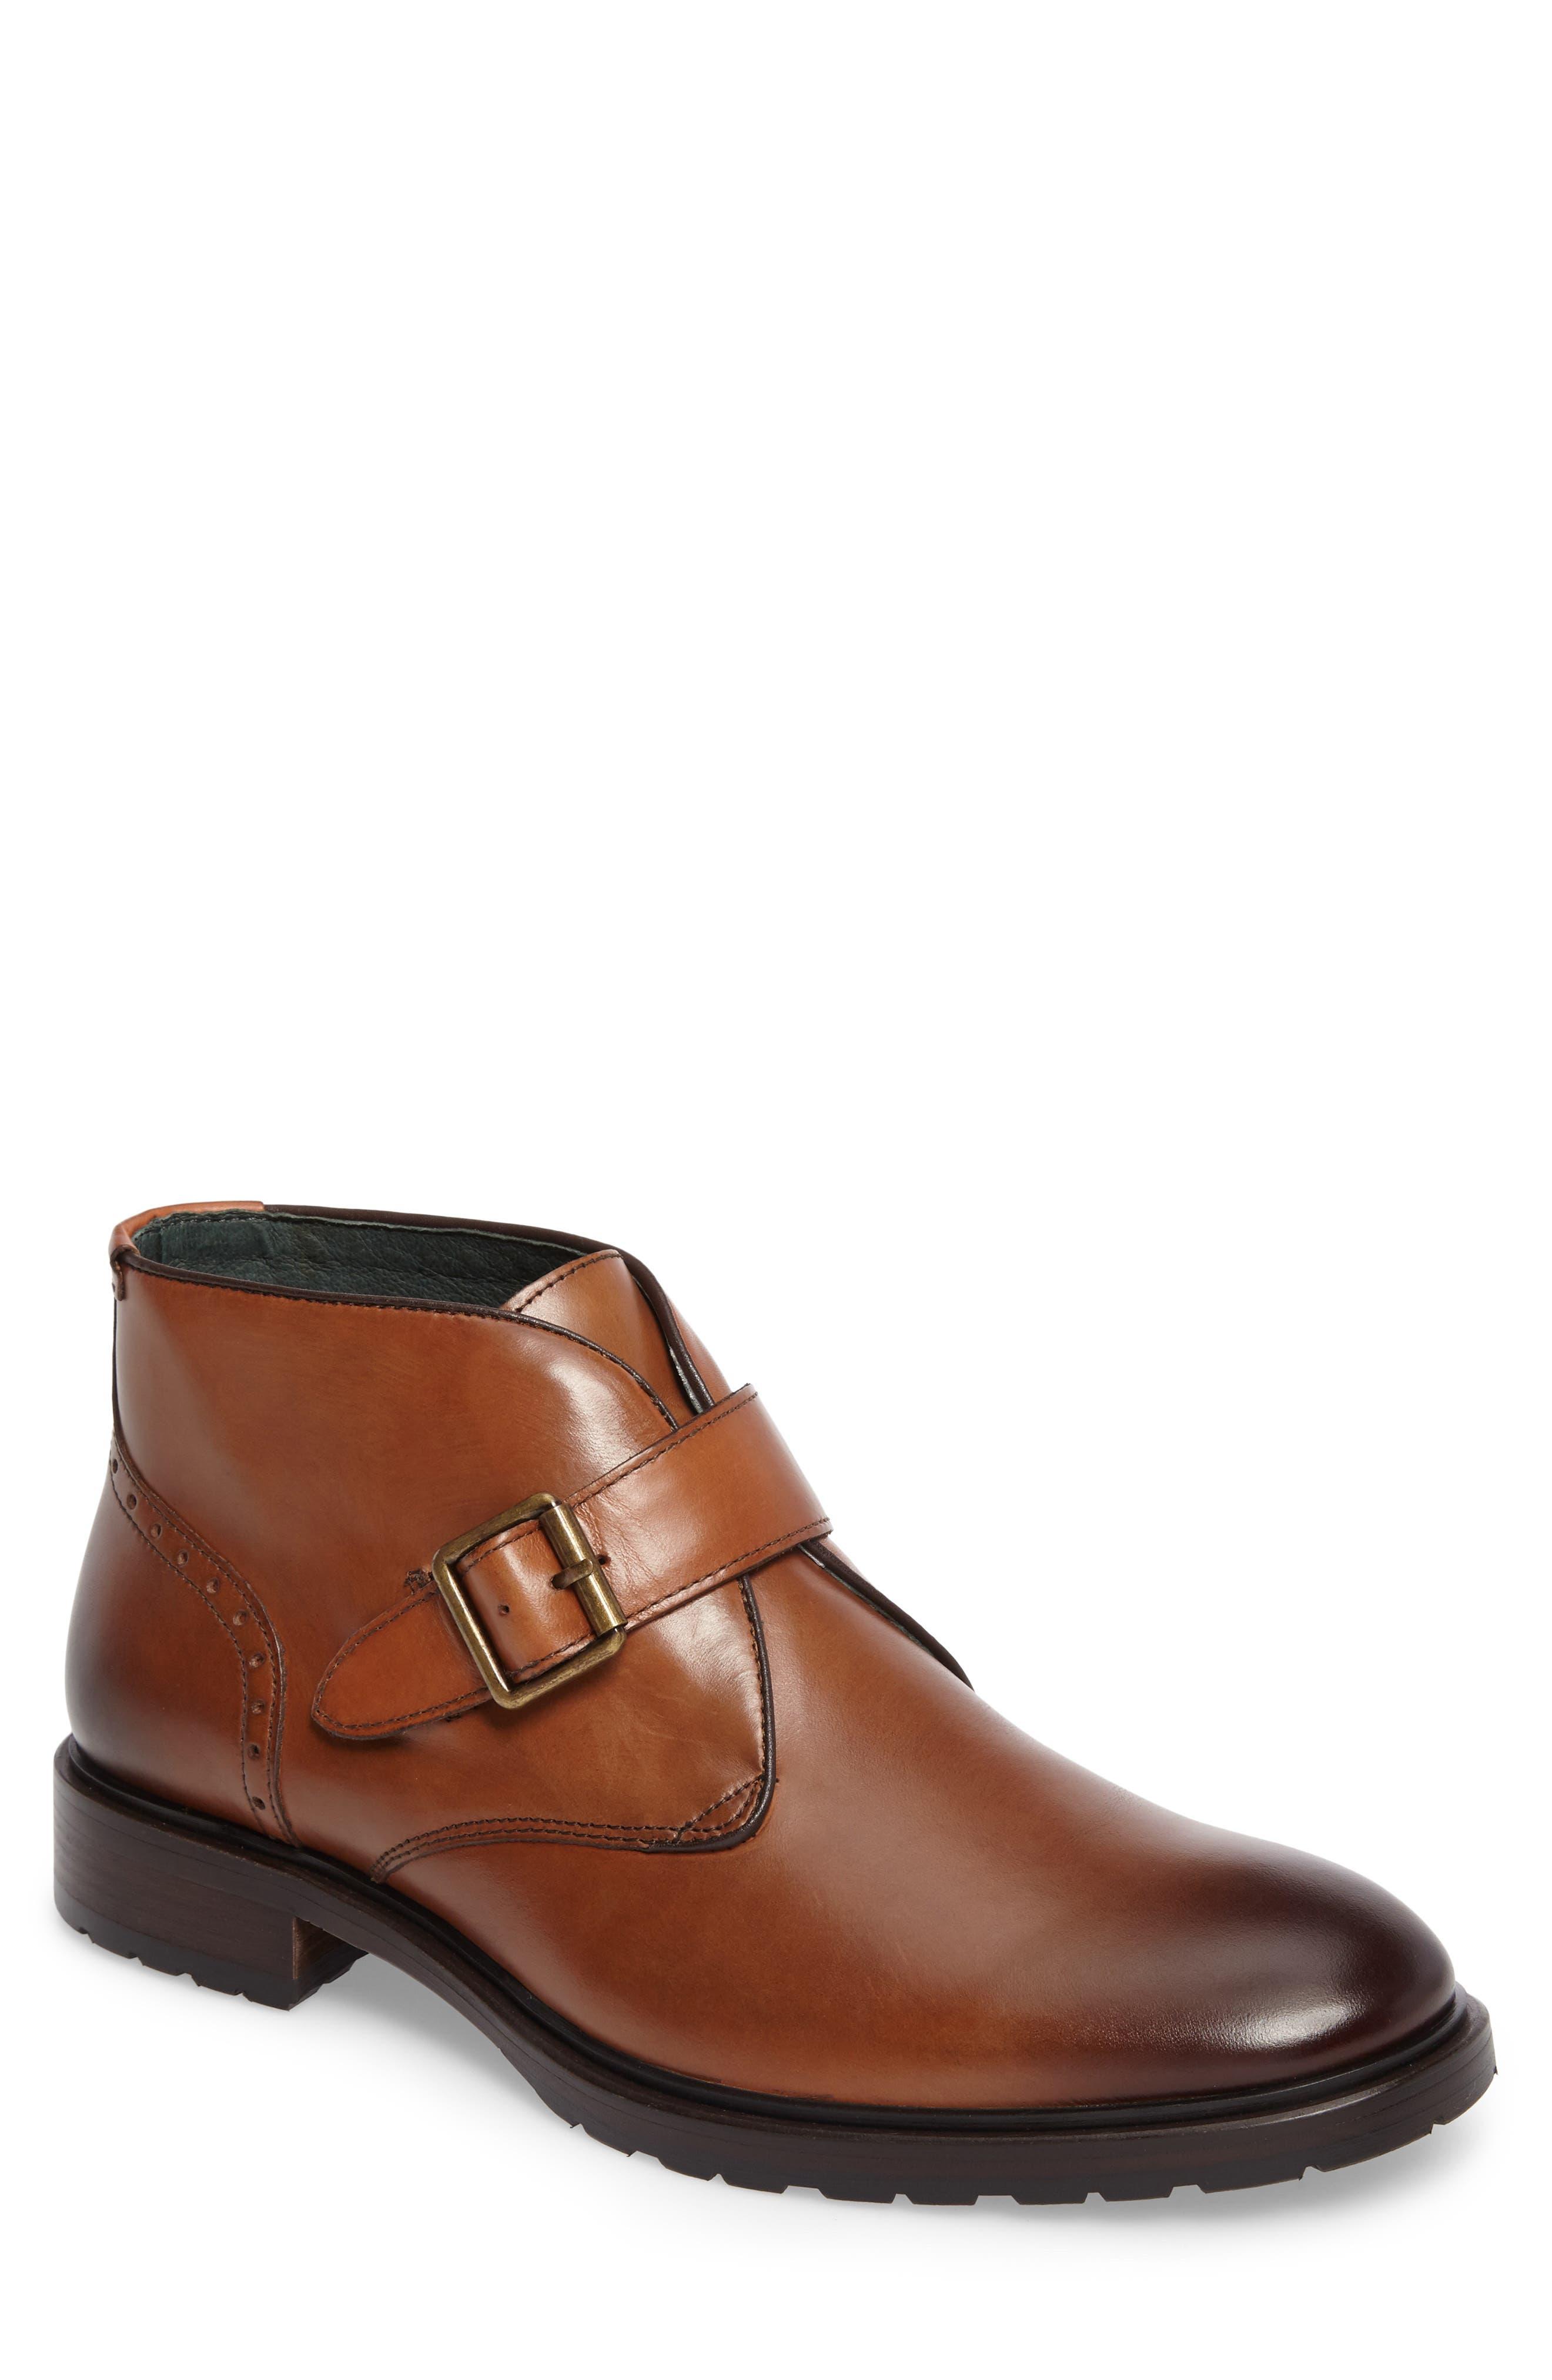 Myles Monk Strap Boot,                         Main,                         color,